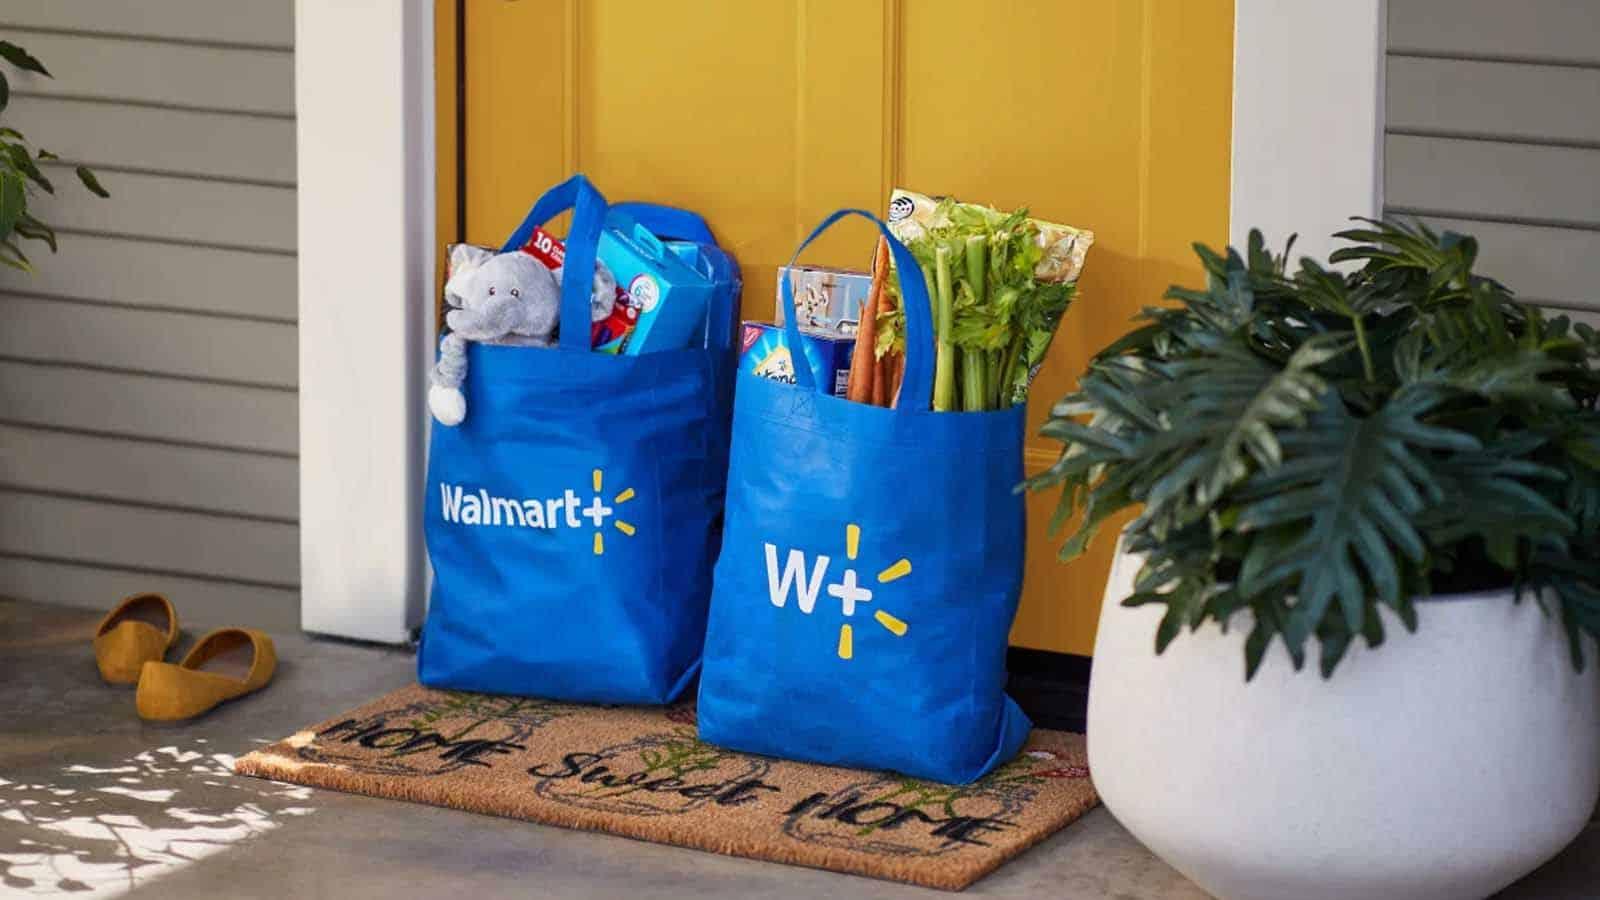 walmart+ delivery